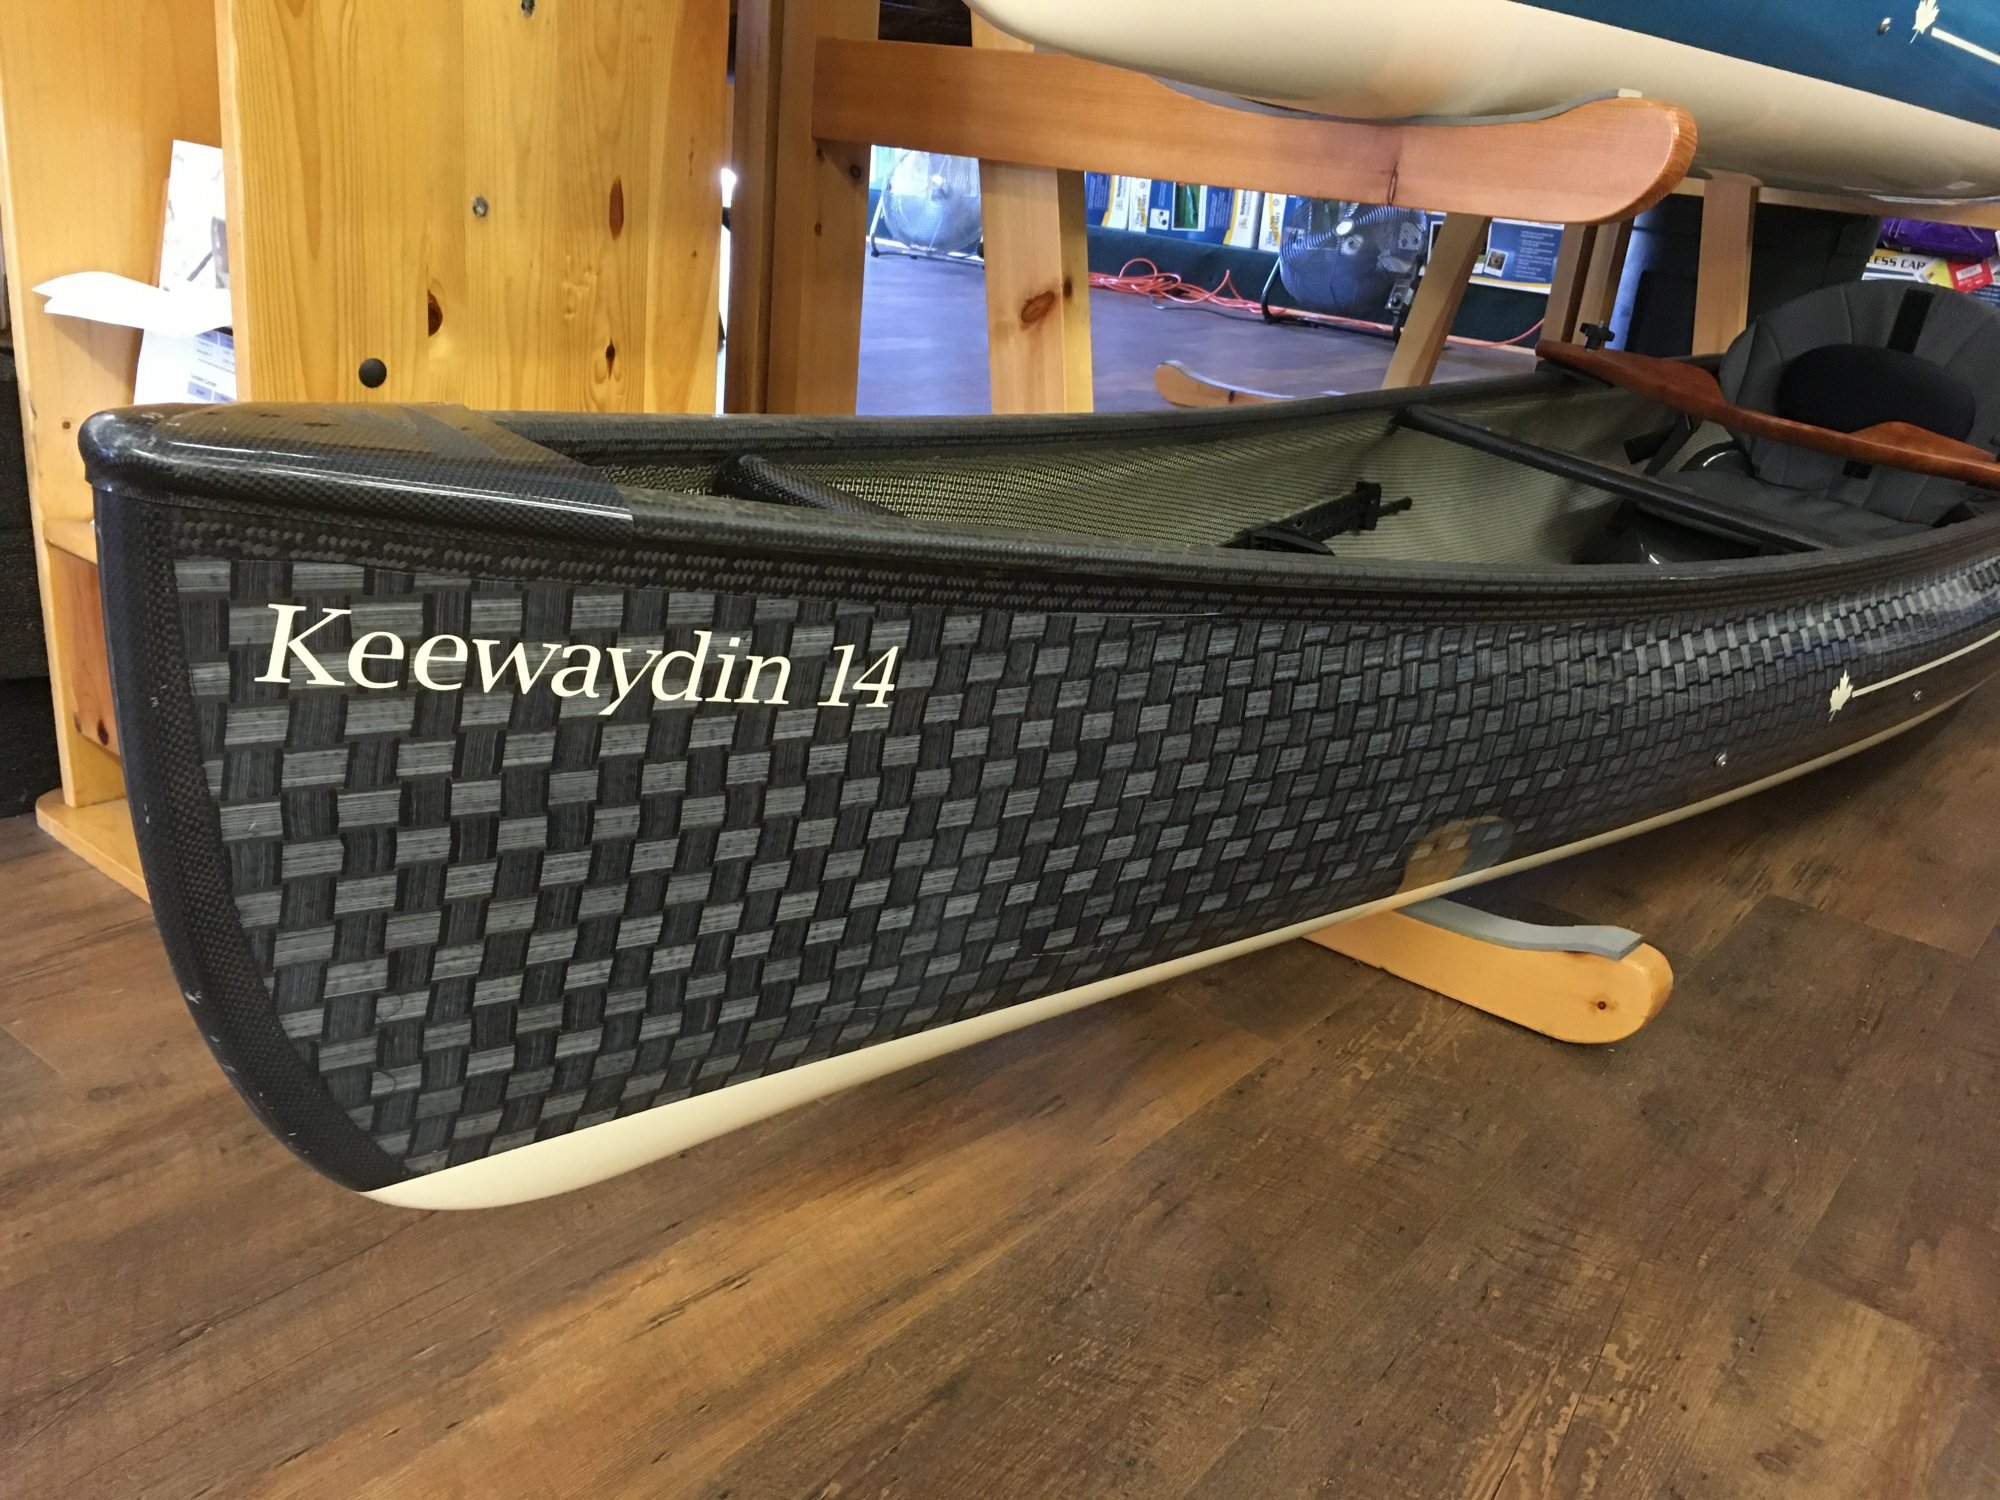 Swift Keewaydin 14 Pack (USED)